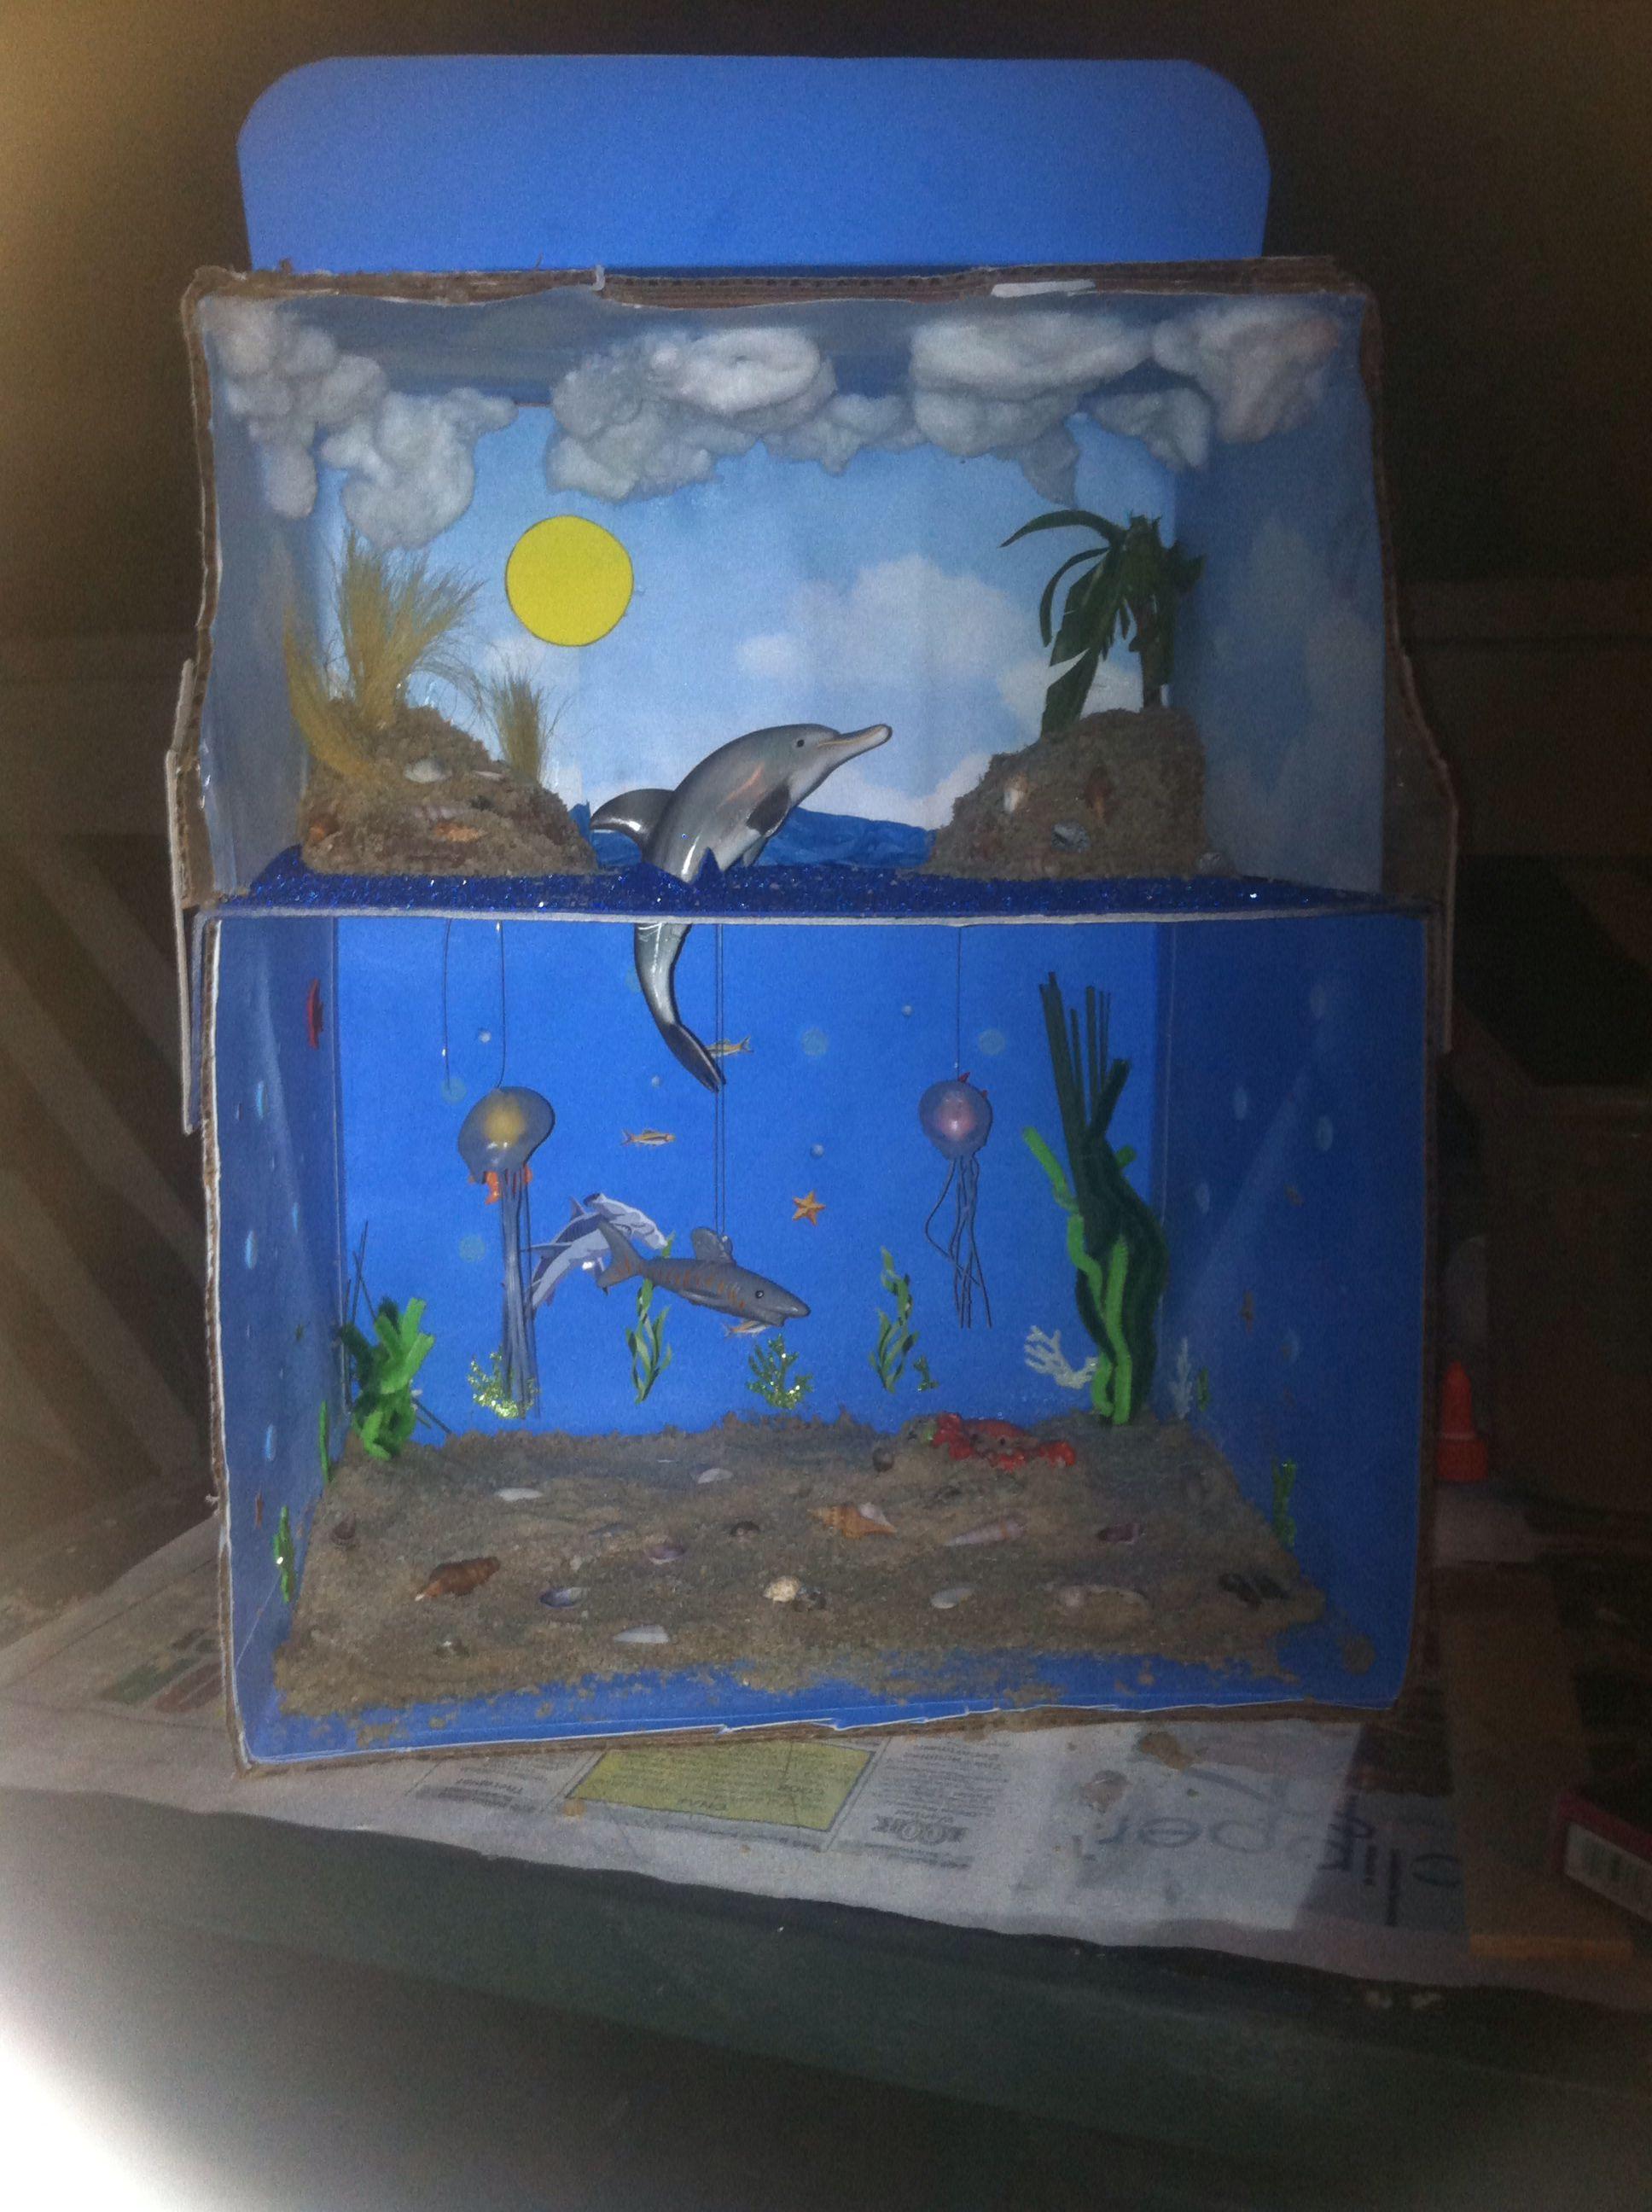 top ocean habitat diorama - photo #23